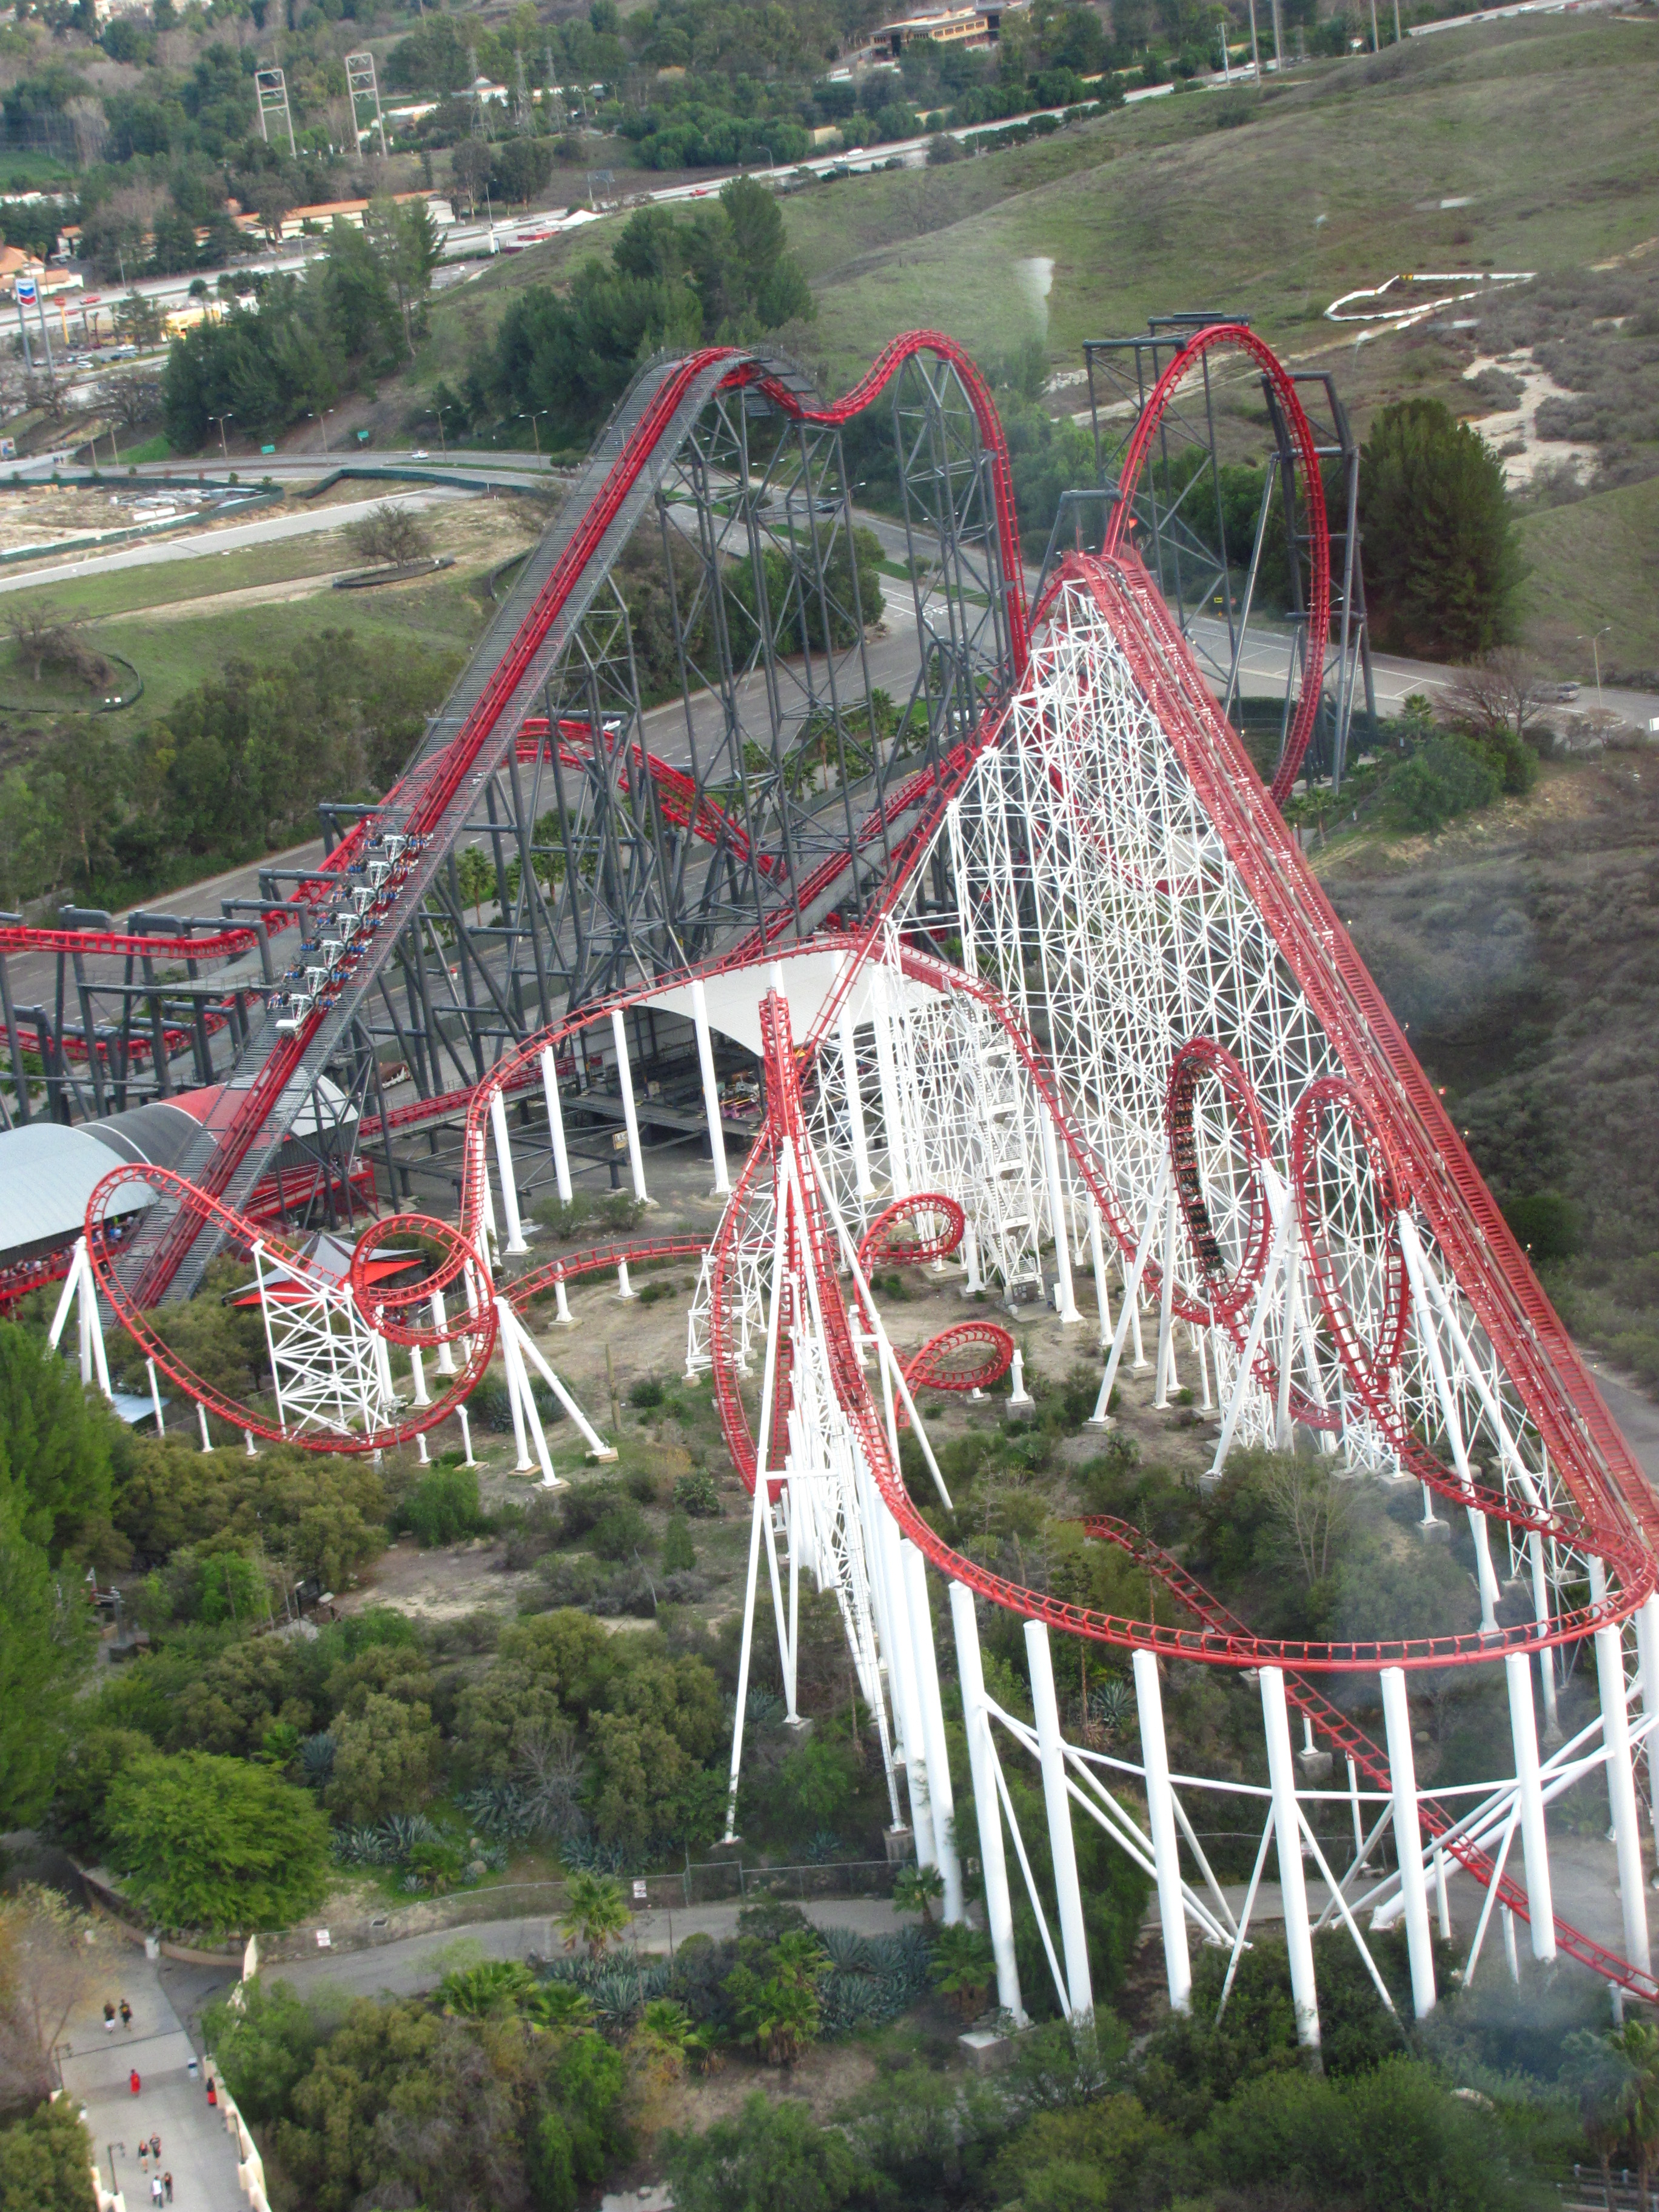 File:X2 and Viper at Six Flags Magic Mountain 2.jpg